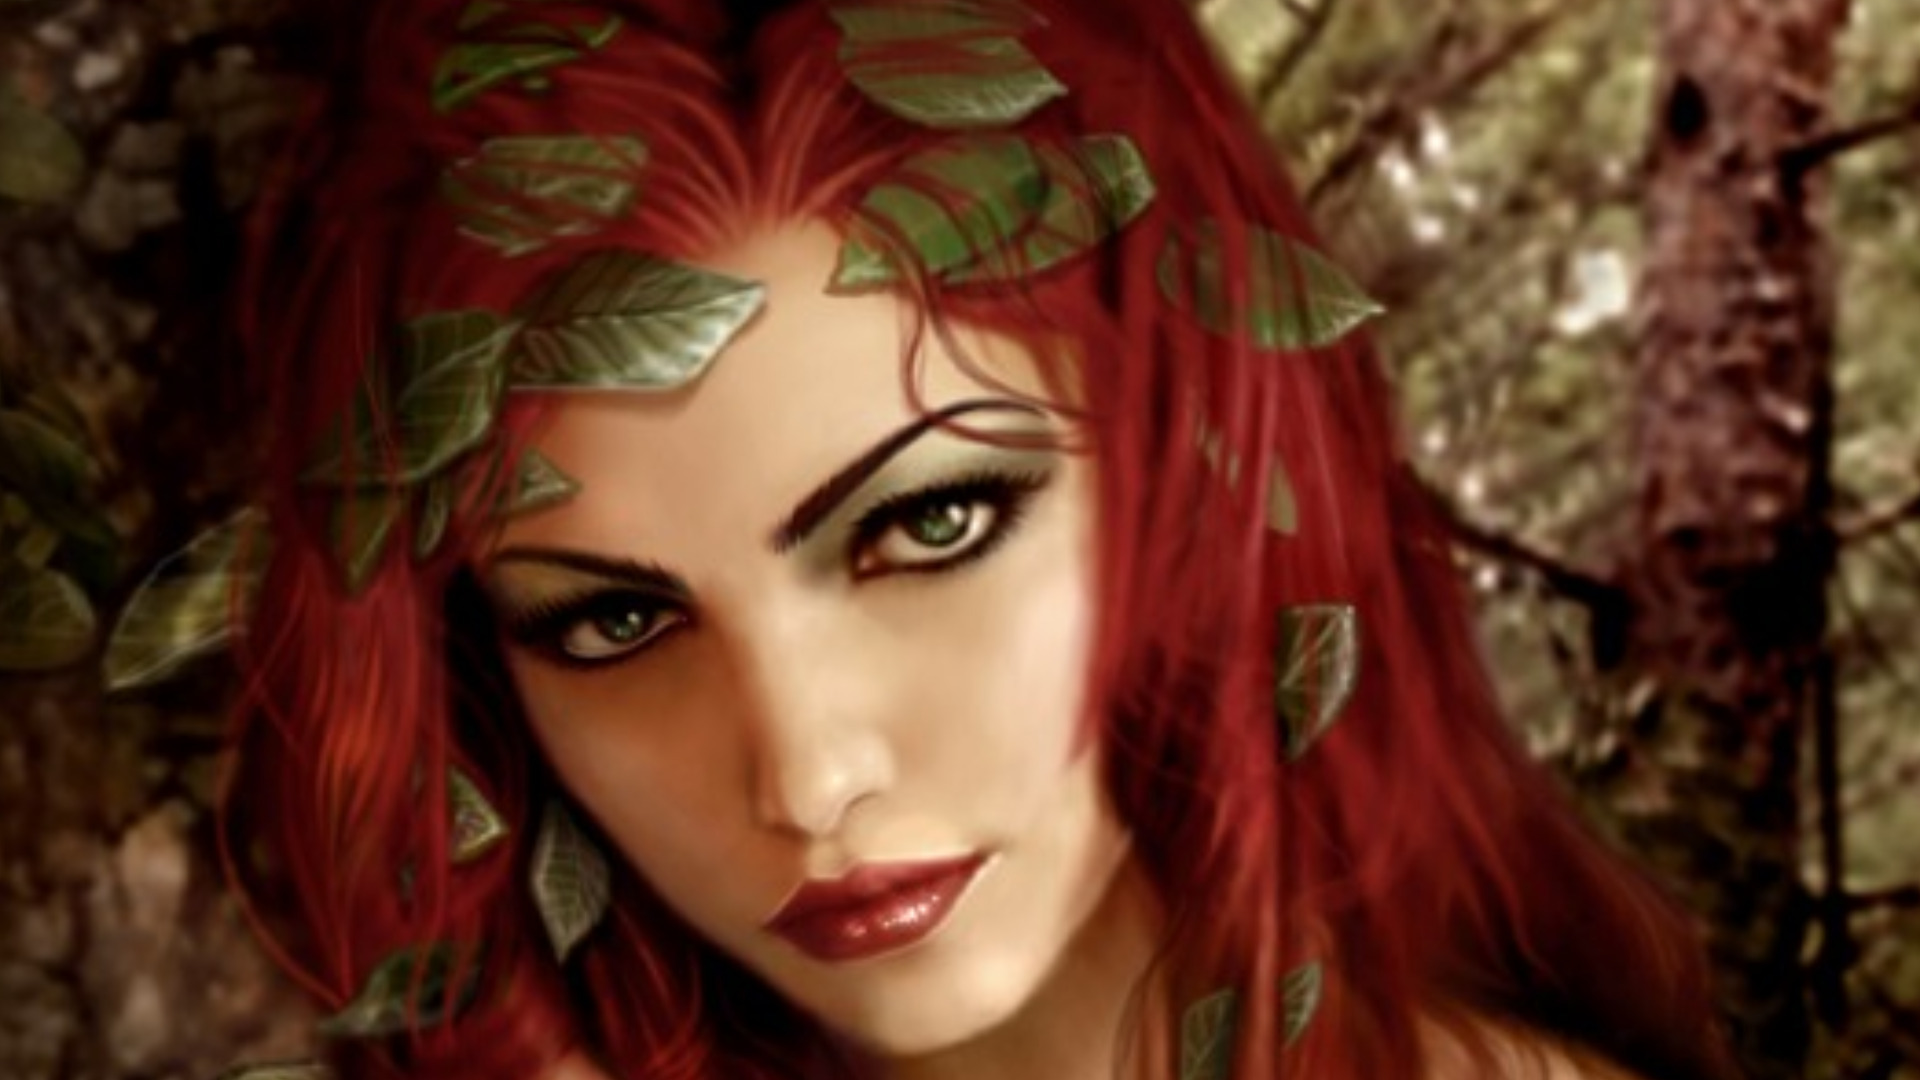 Fantasy Girl Background